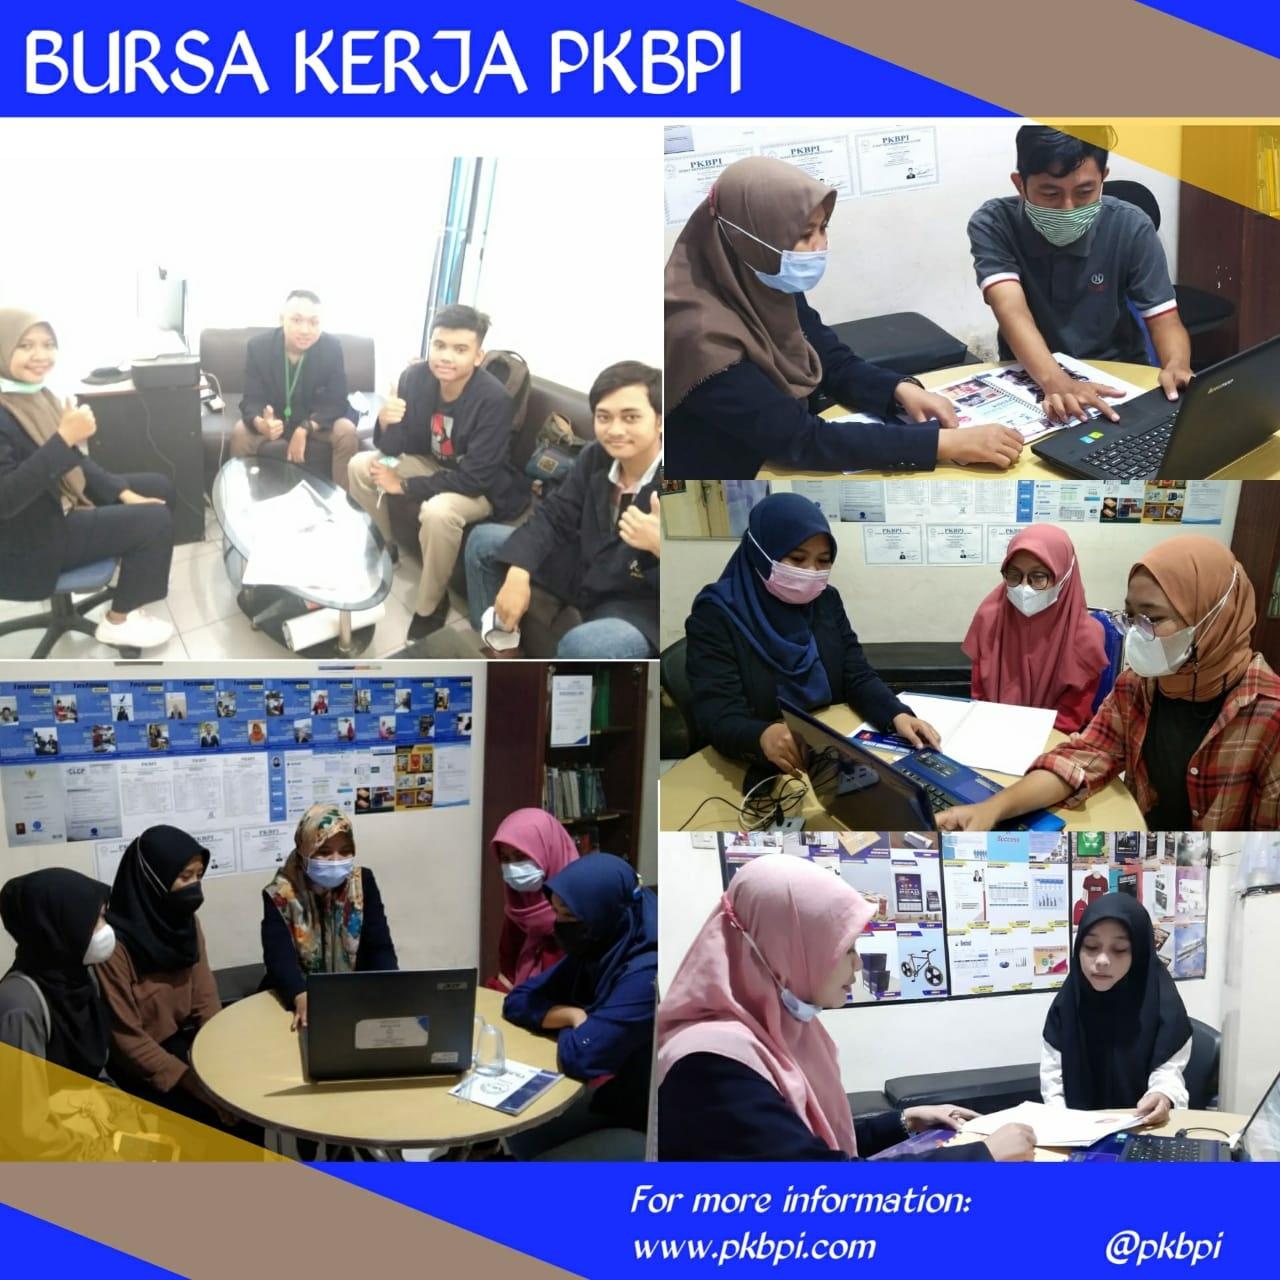 Bursa Kerja PKBPI - Kusus Komputer Online Surabaya PKBPI